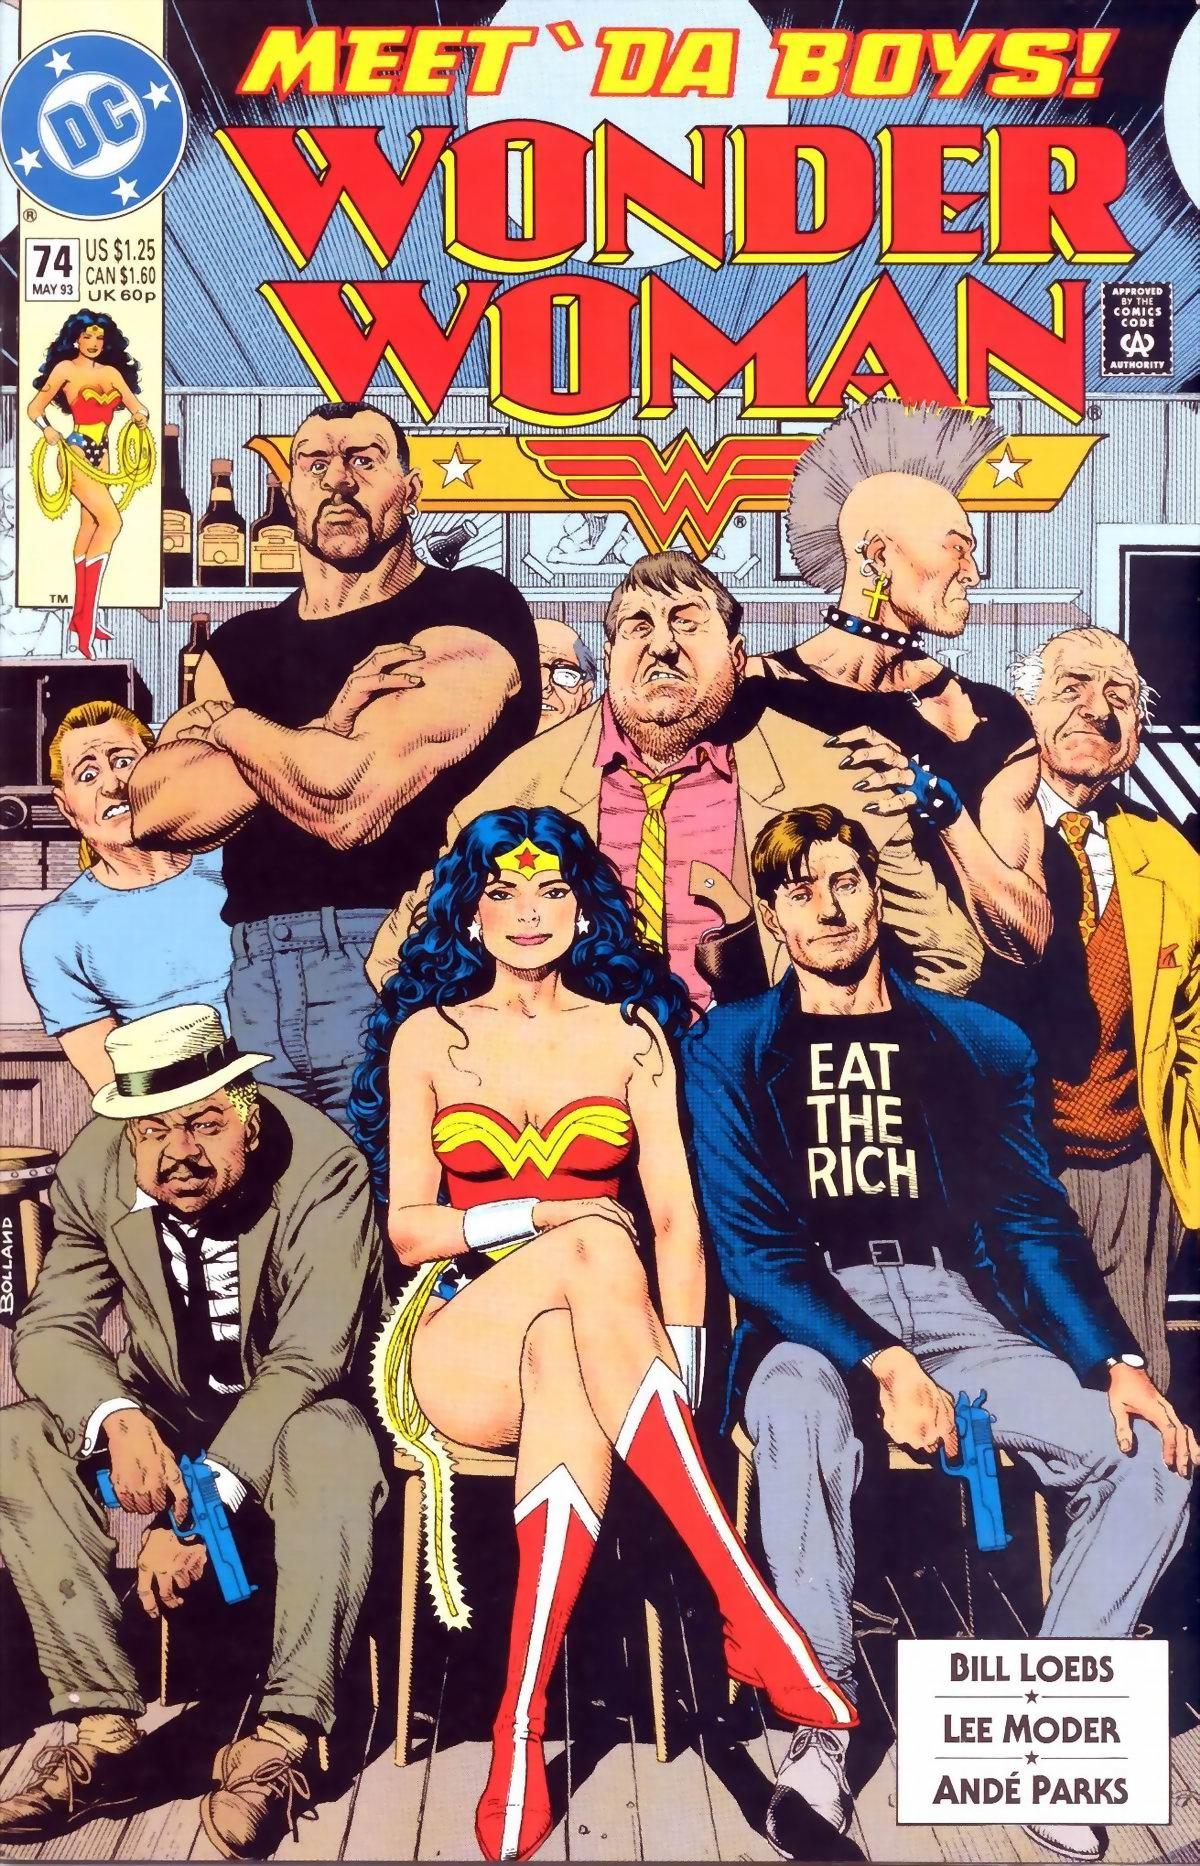 Read online Wonder Woman (1987) comic -  Issue #74 - 1